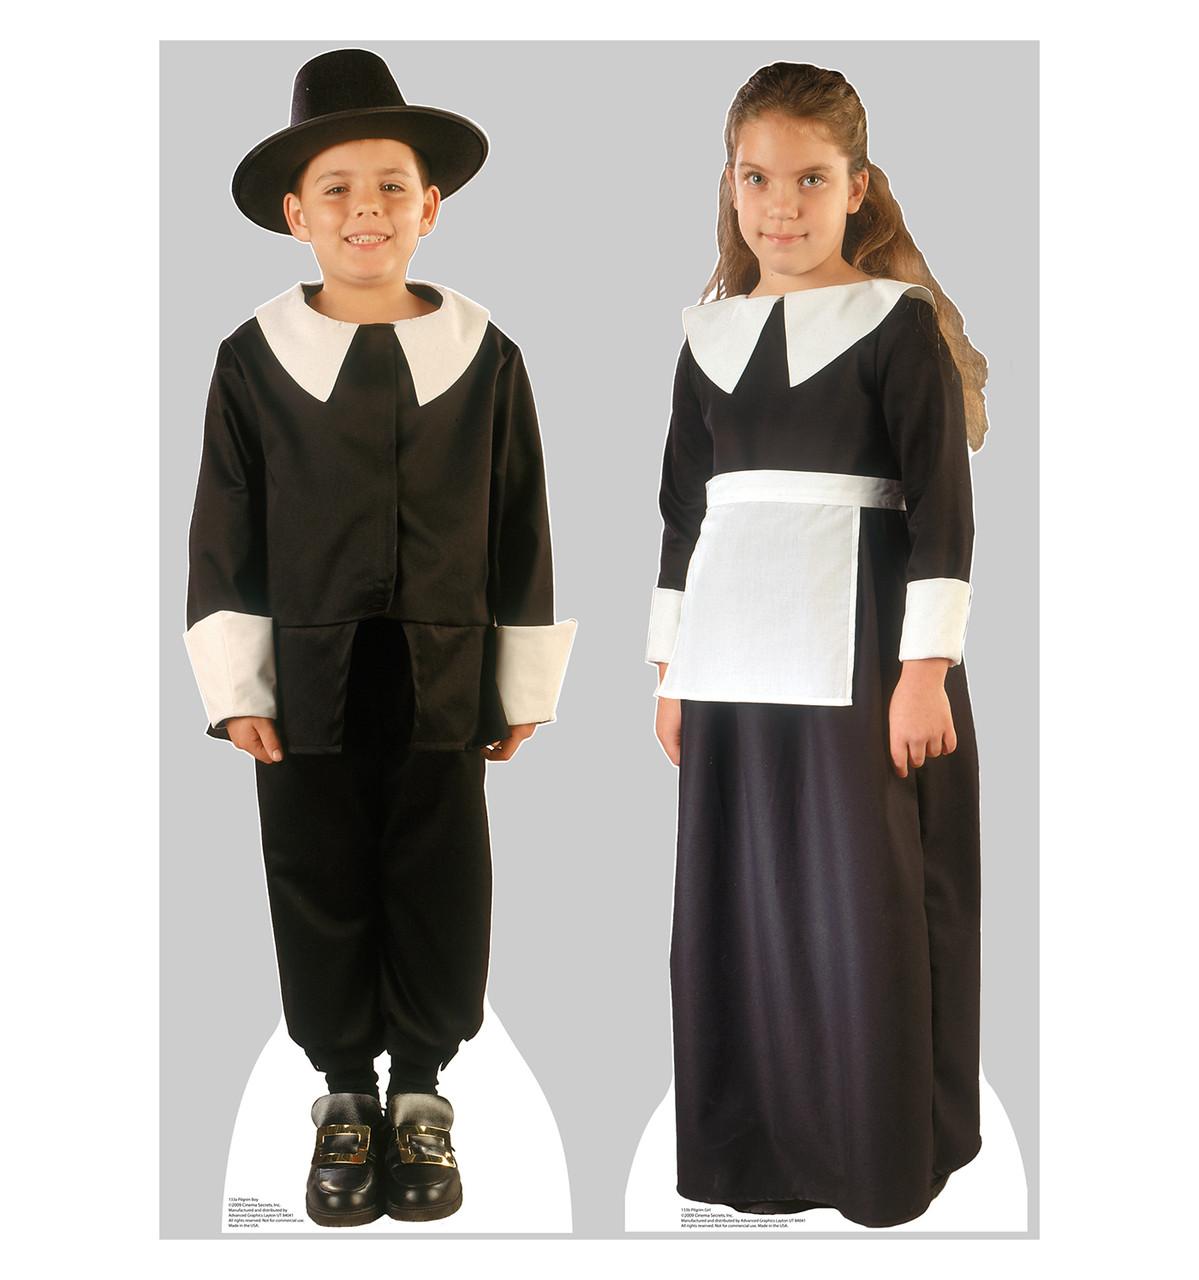 Life-size Pilgrim Boy and Girl Cardboard Standup | Cardboard Cutout